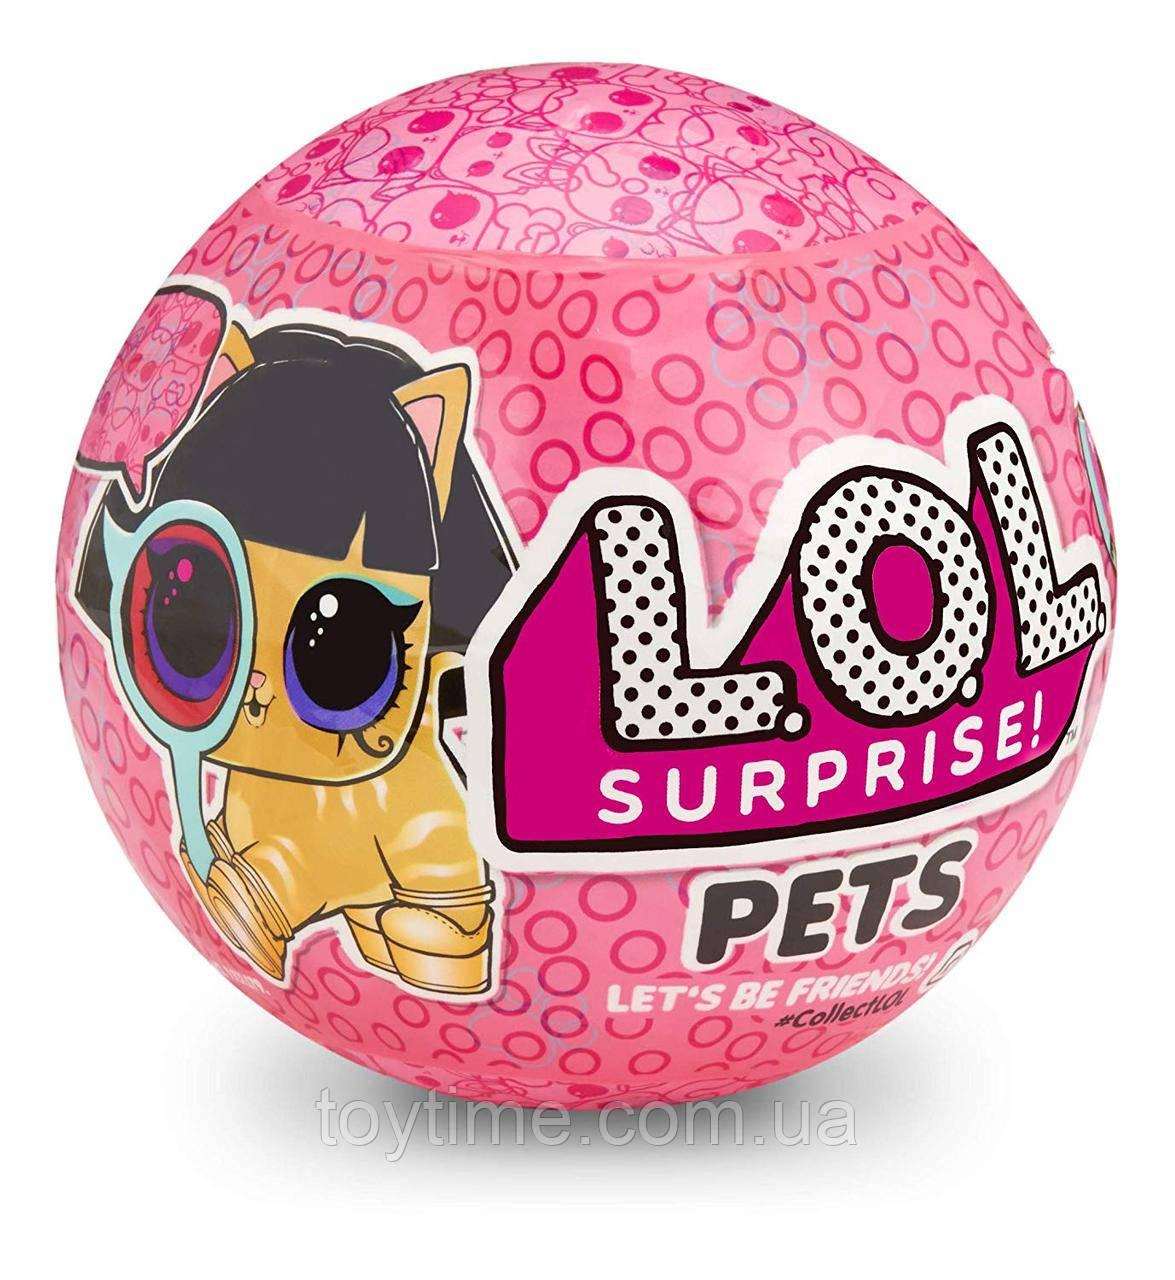 L.O.L. питомцы декодер 4 сезон 2 волна серия шпионы / L.O.L. Surprise Pets Eye Spy Series 4 Season 2 series